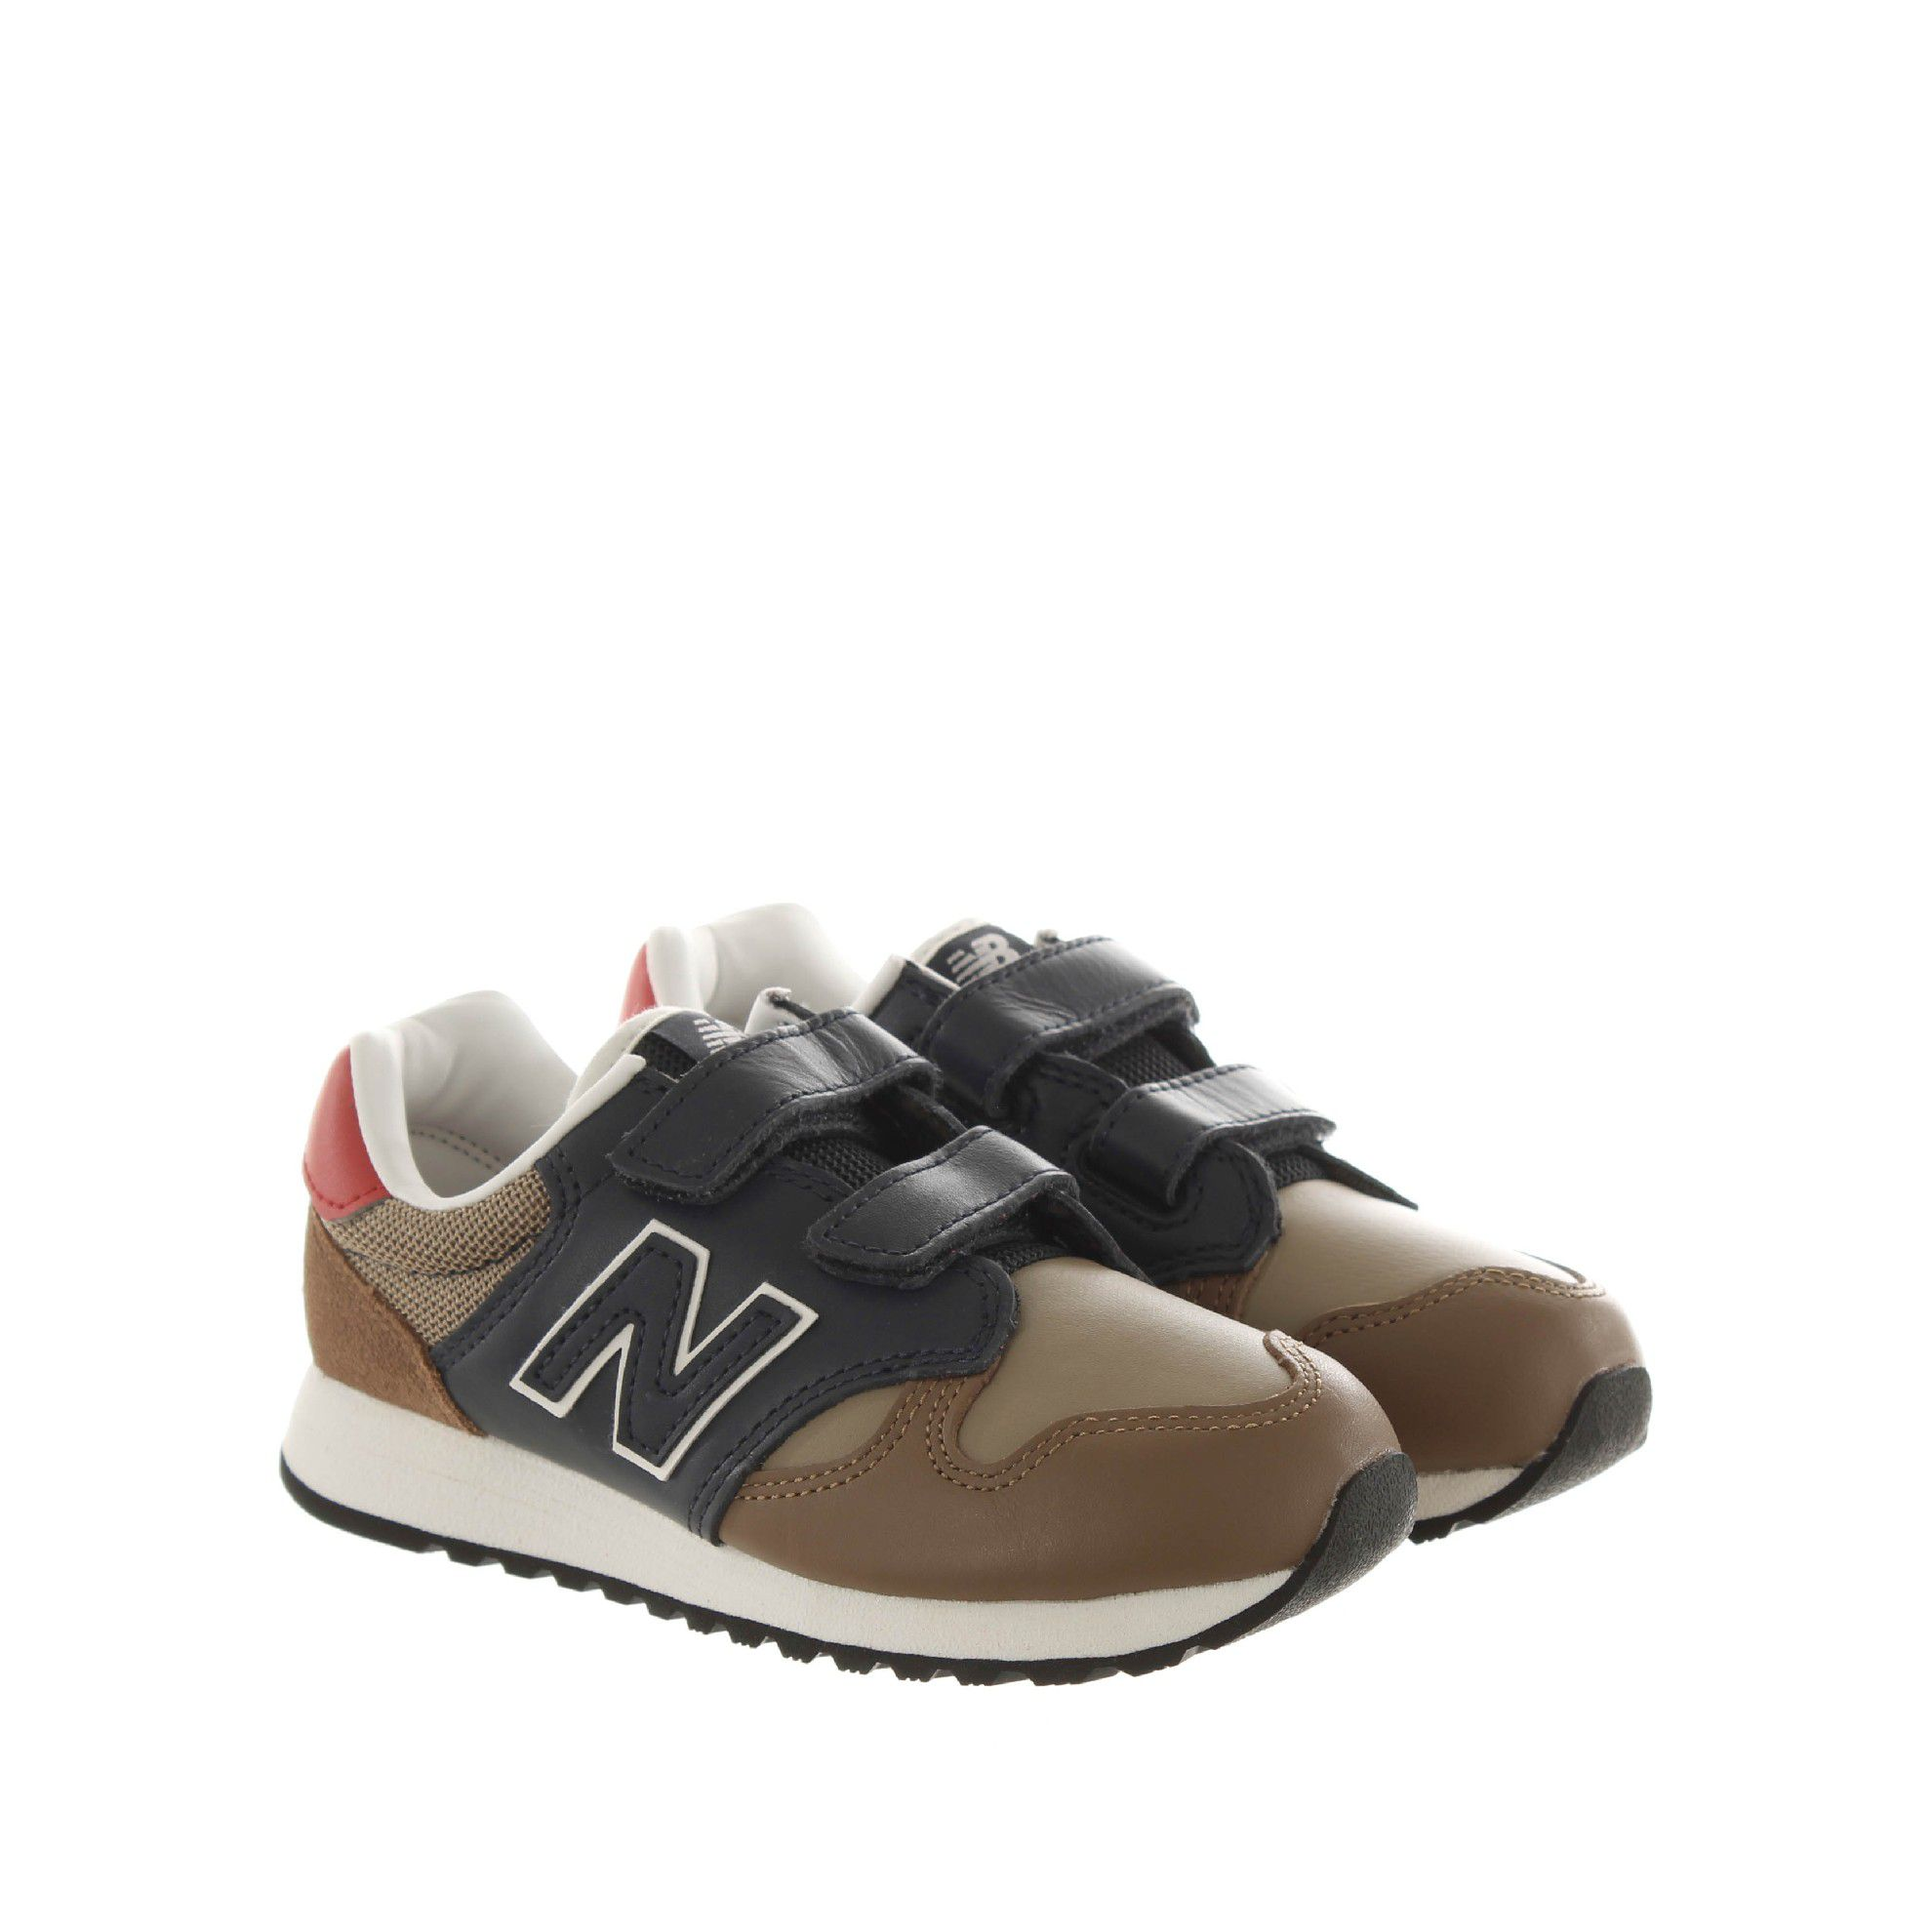 New balance sneaker 520 in pelle e mesh da bambino